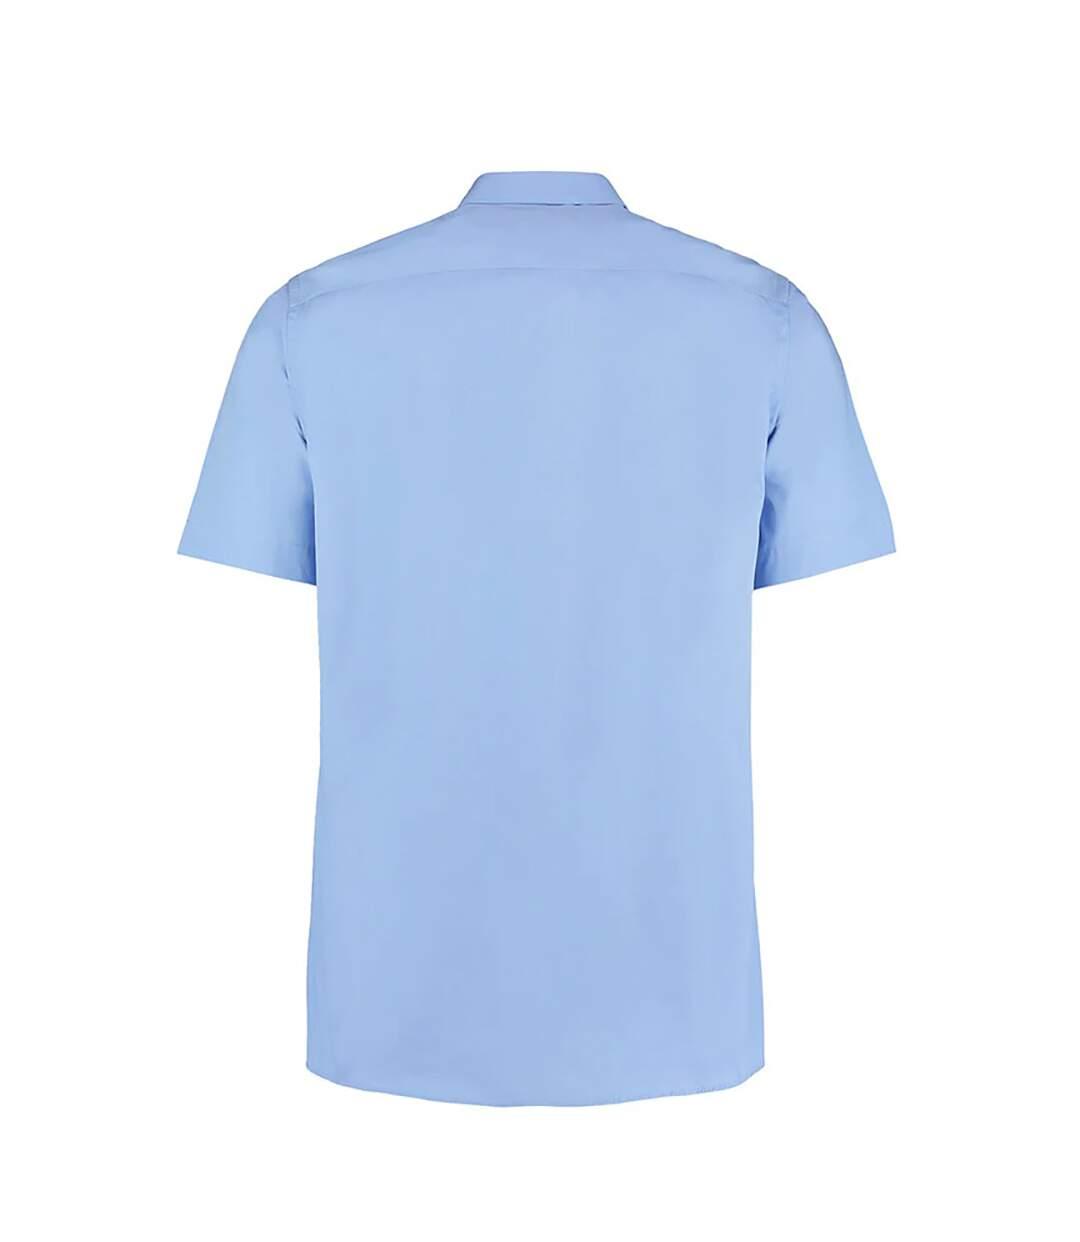 Kustom Kit Mens City Short Sleeve Business Shirt (Black) - UTBC1448